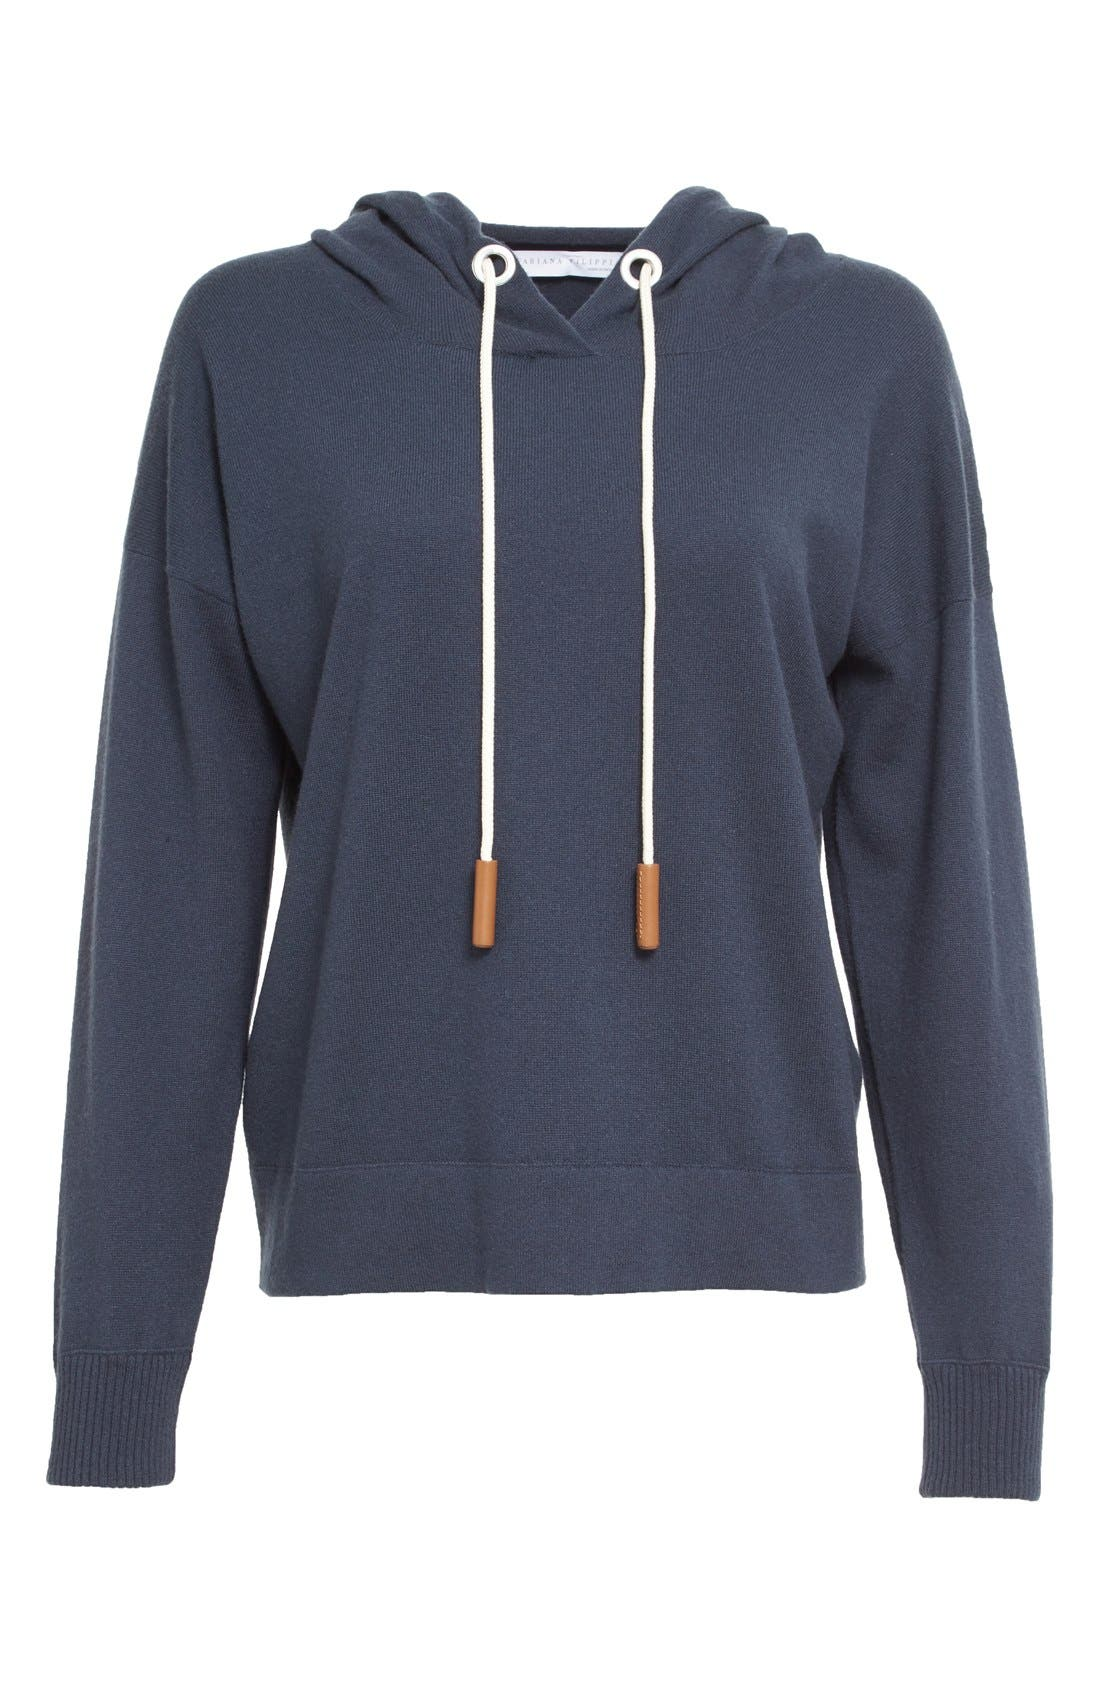 Cashmere Hooded Sweatshirt,                             Alternate thumbnail 4, color,                             Slate Blue